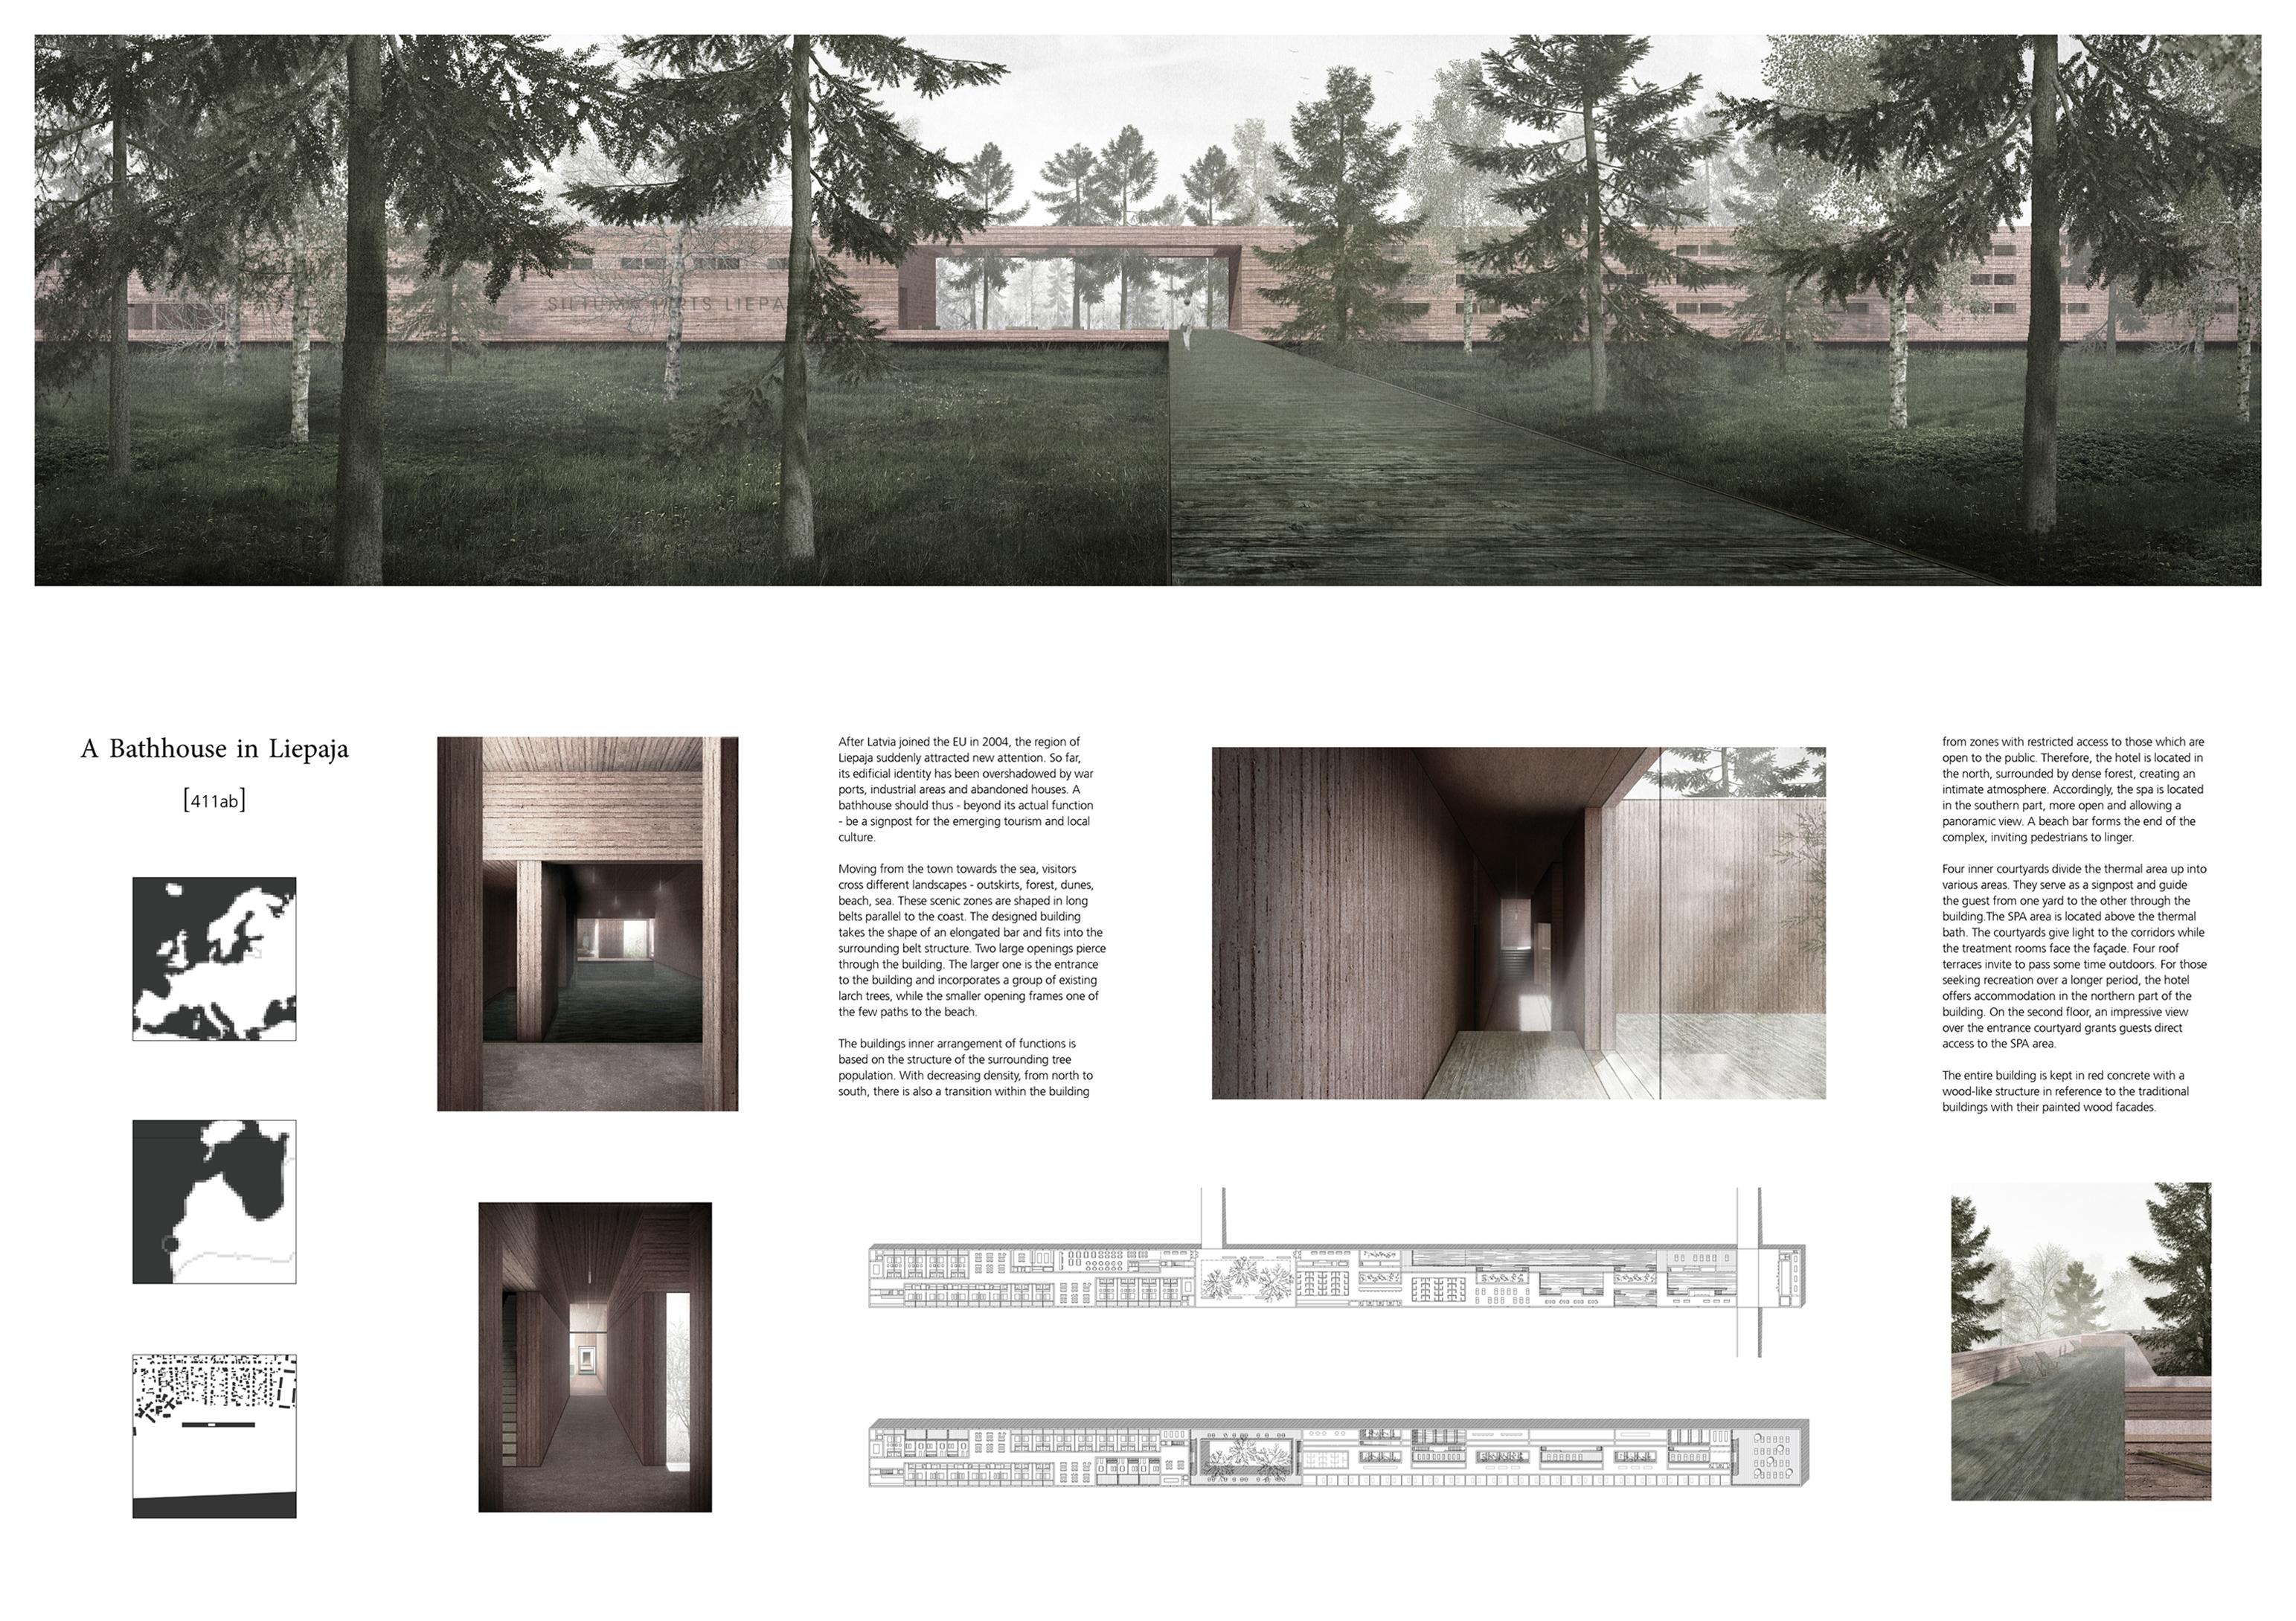 A Bathhouse in Liepaja Board